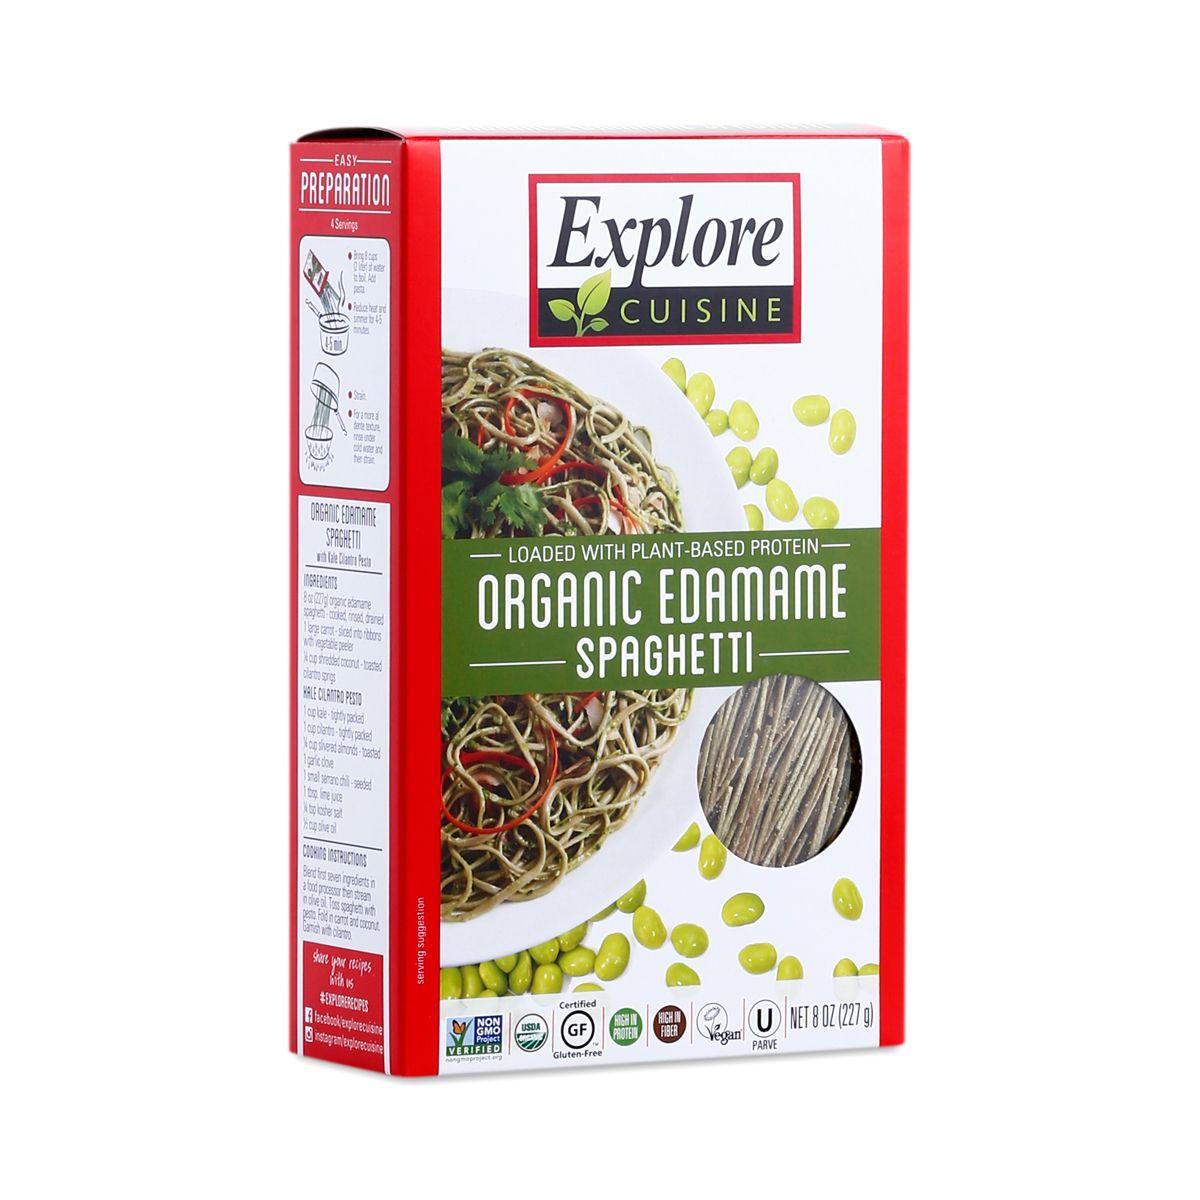 Explore Cuisine Organic Edamame Spaghetti Edamame Spaghetti Organic Pasta Edamame